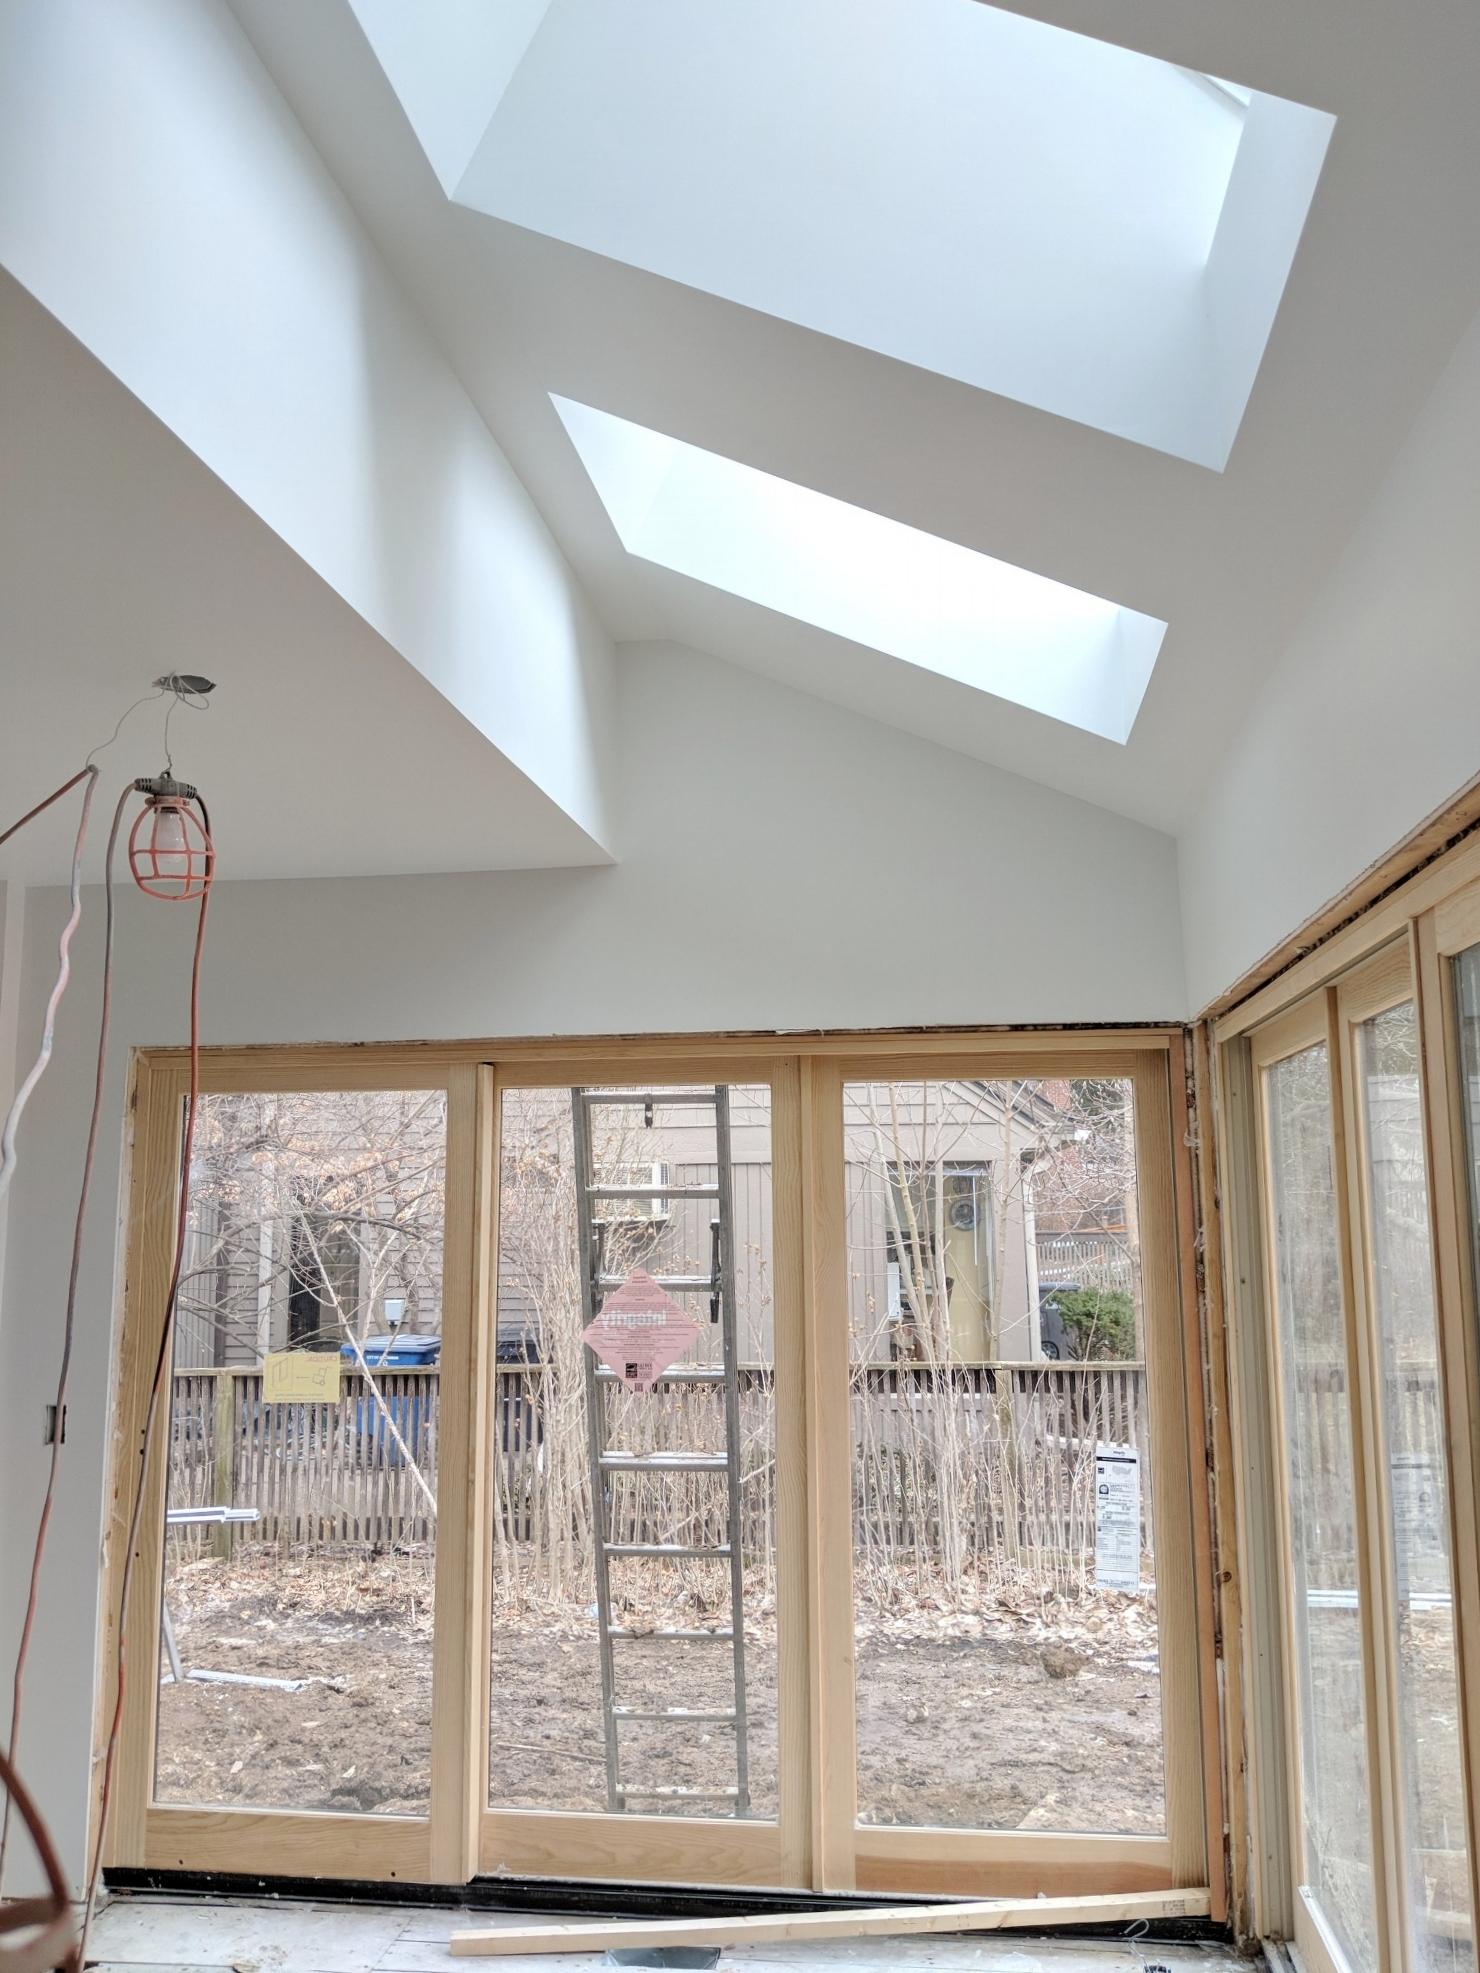 New skylights installed